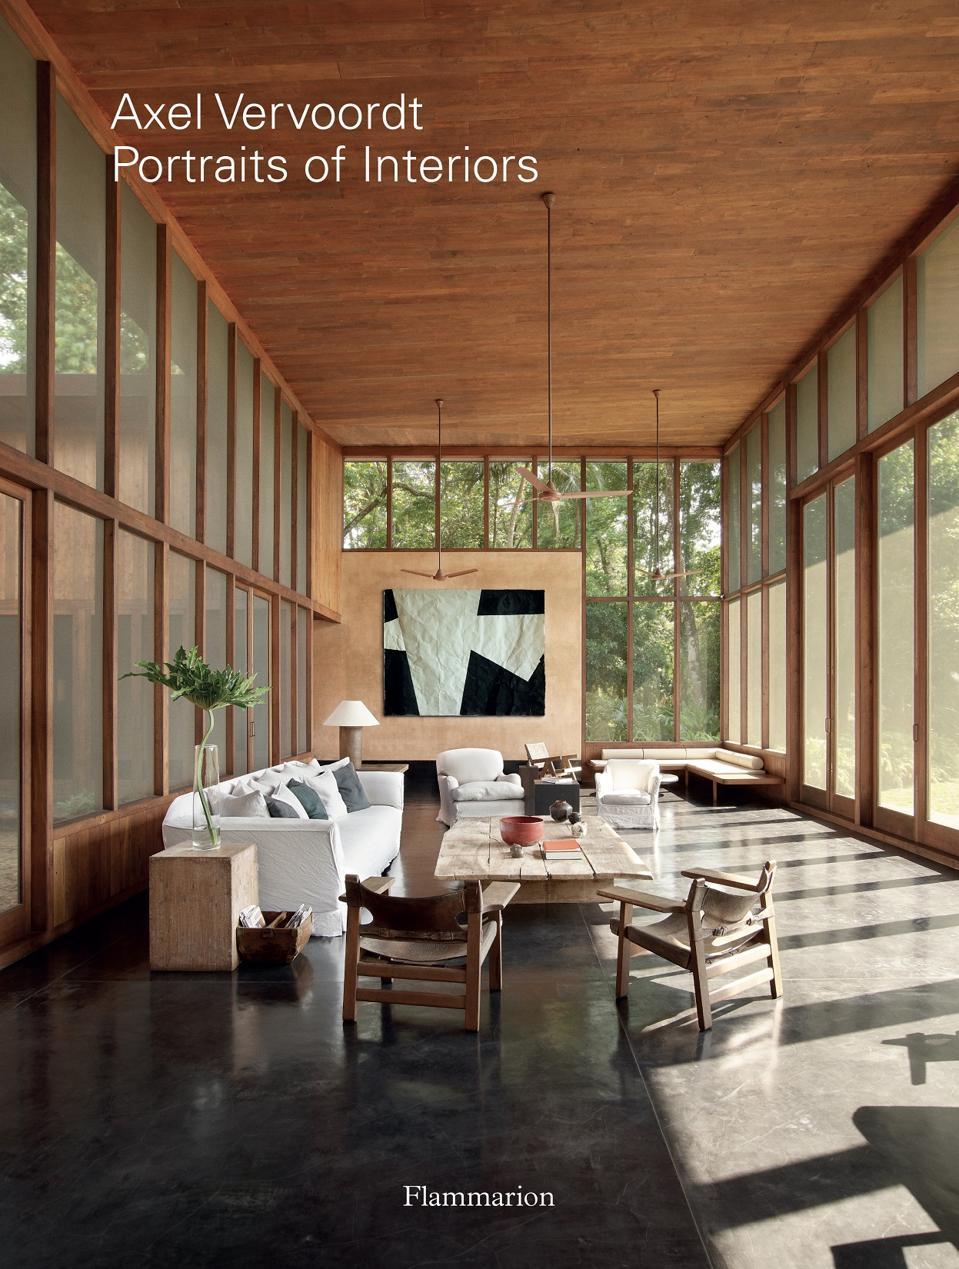 ″Axel Vervoordt: Portraits of Interiors″